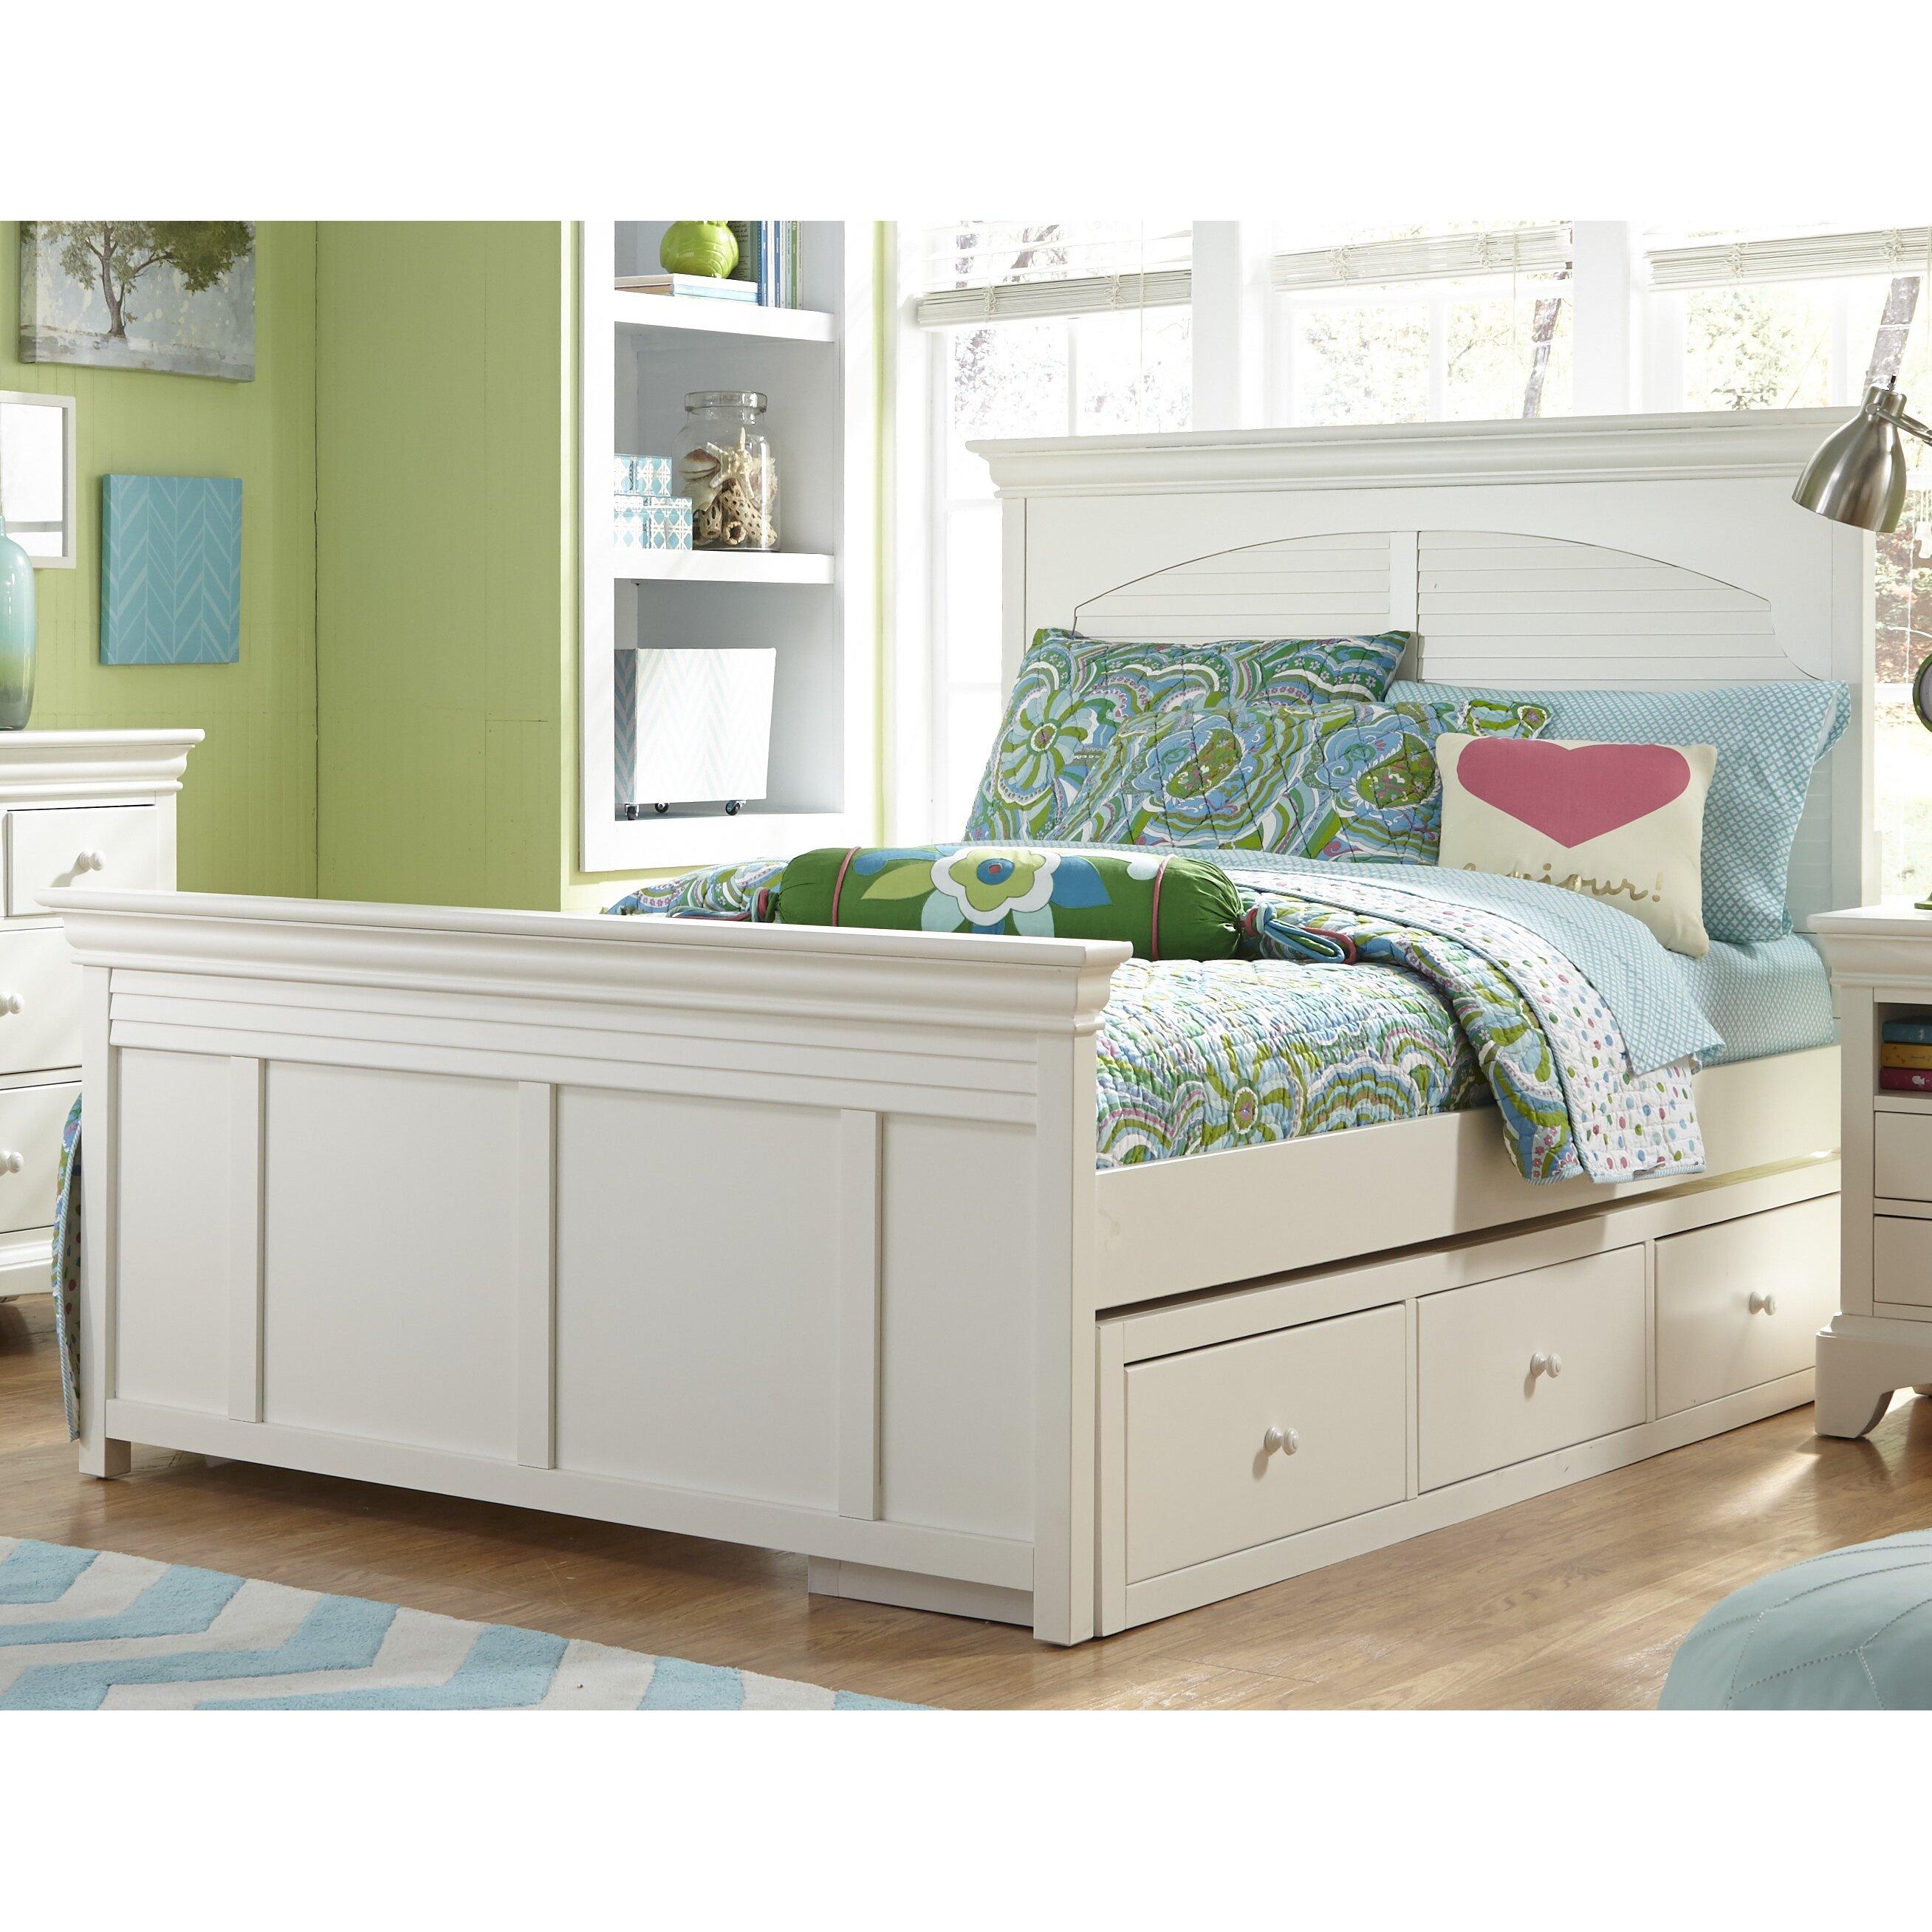 My Home Furnishings Neopolitan Panel Customizable Bedroom Set Reviews Wayfair Supply